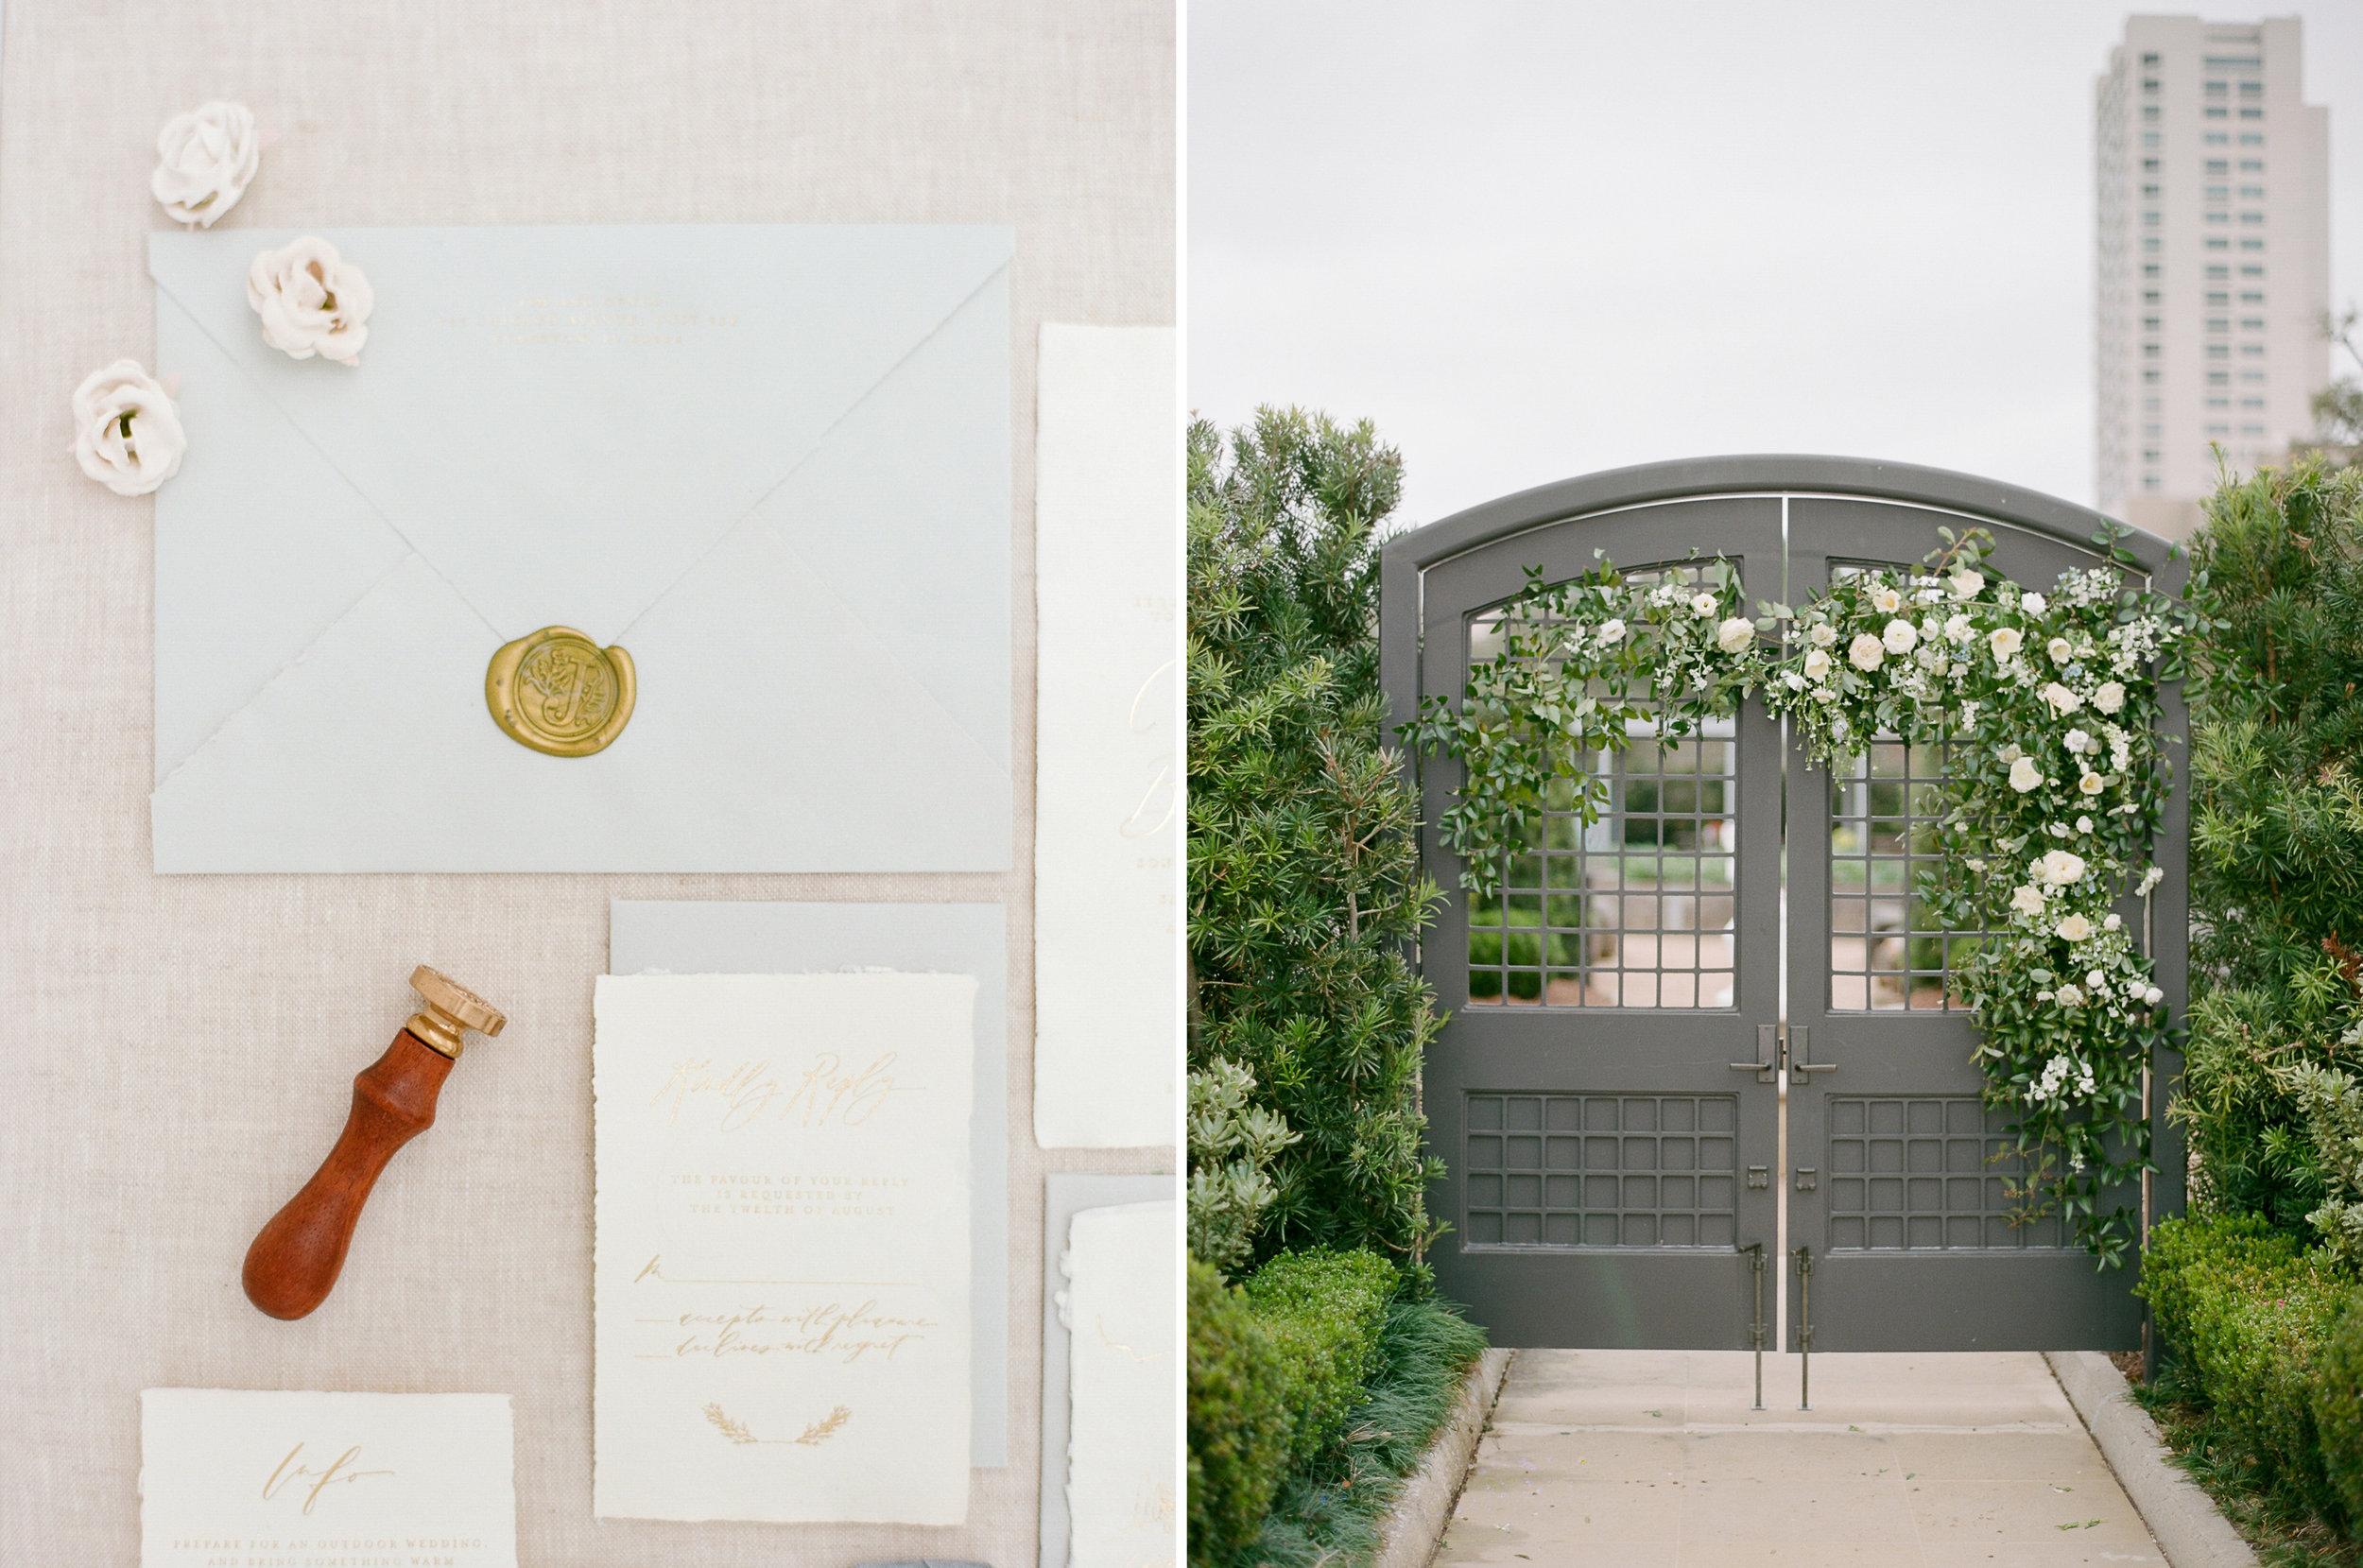 McGovern-Centennial-Gardens-Houston-Texas-Wedding-Venue-Josh-Dana-Fernandez-Photography-Film-Destination-Fine-Art-Luxury-Top-Best-Austin-Dallas-Magnolia-Rouge-Jennifer-Laura-Design-101.jpg